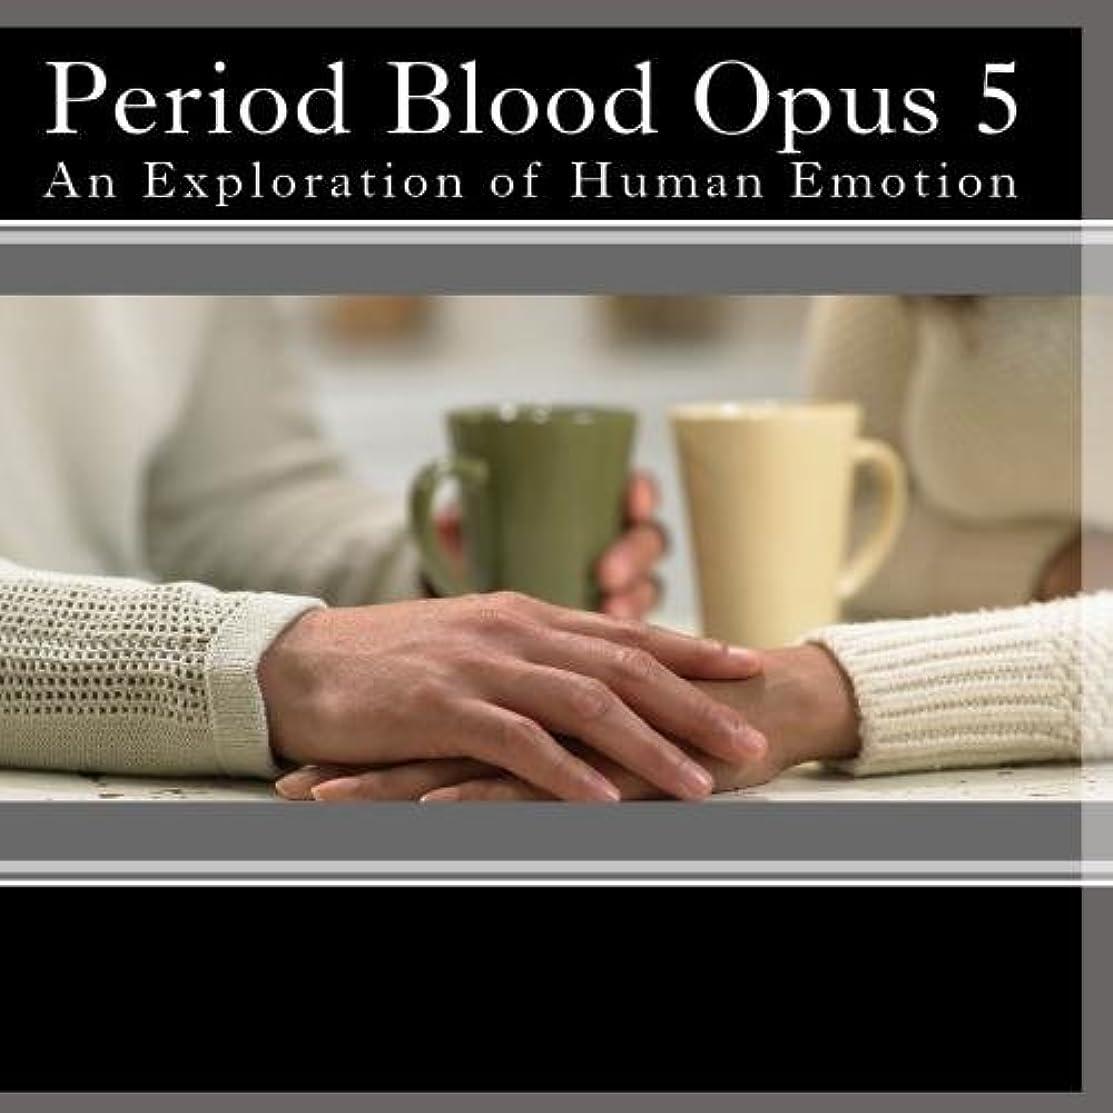 Period Blood Opus 5